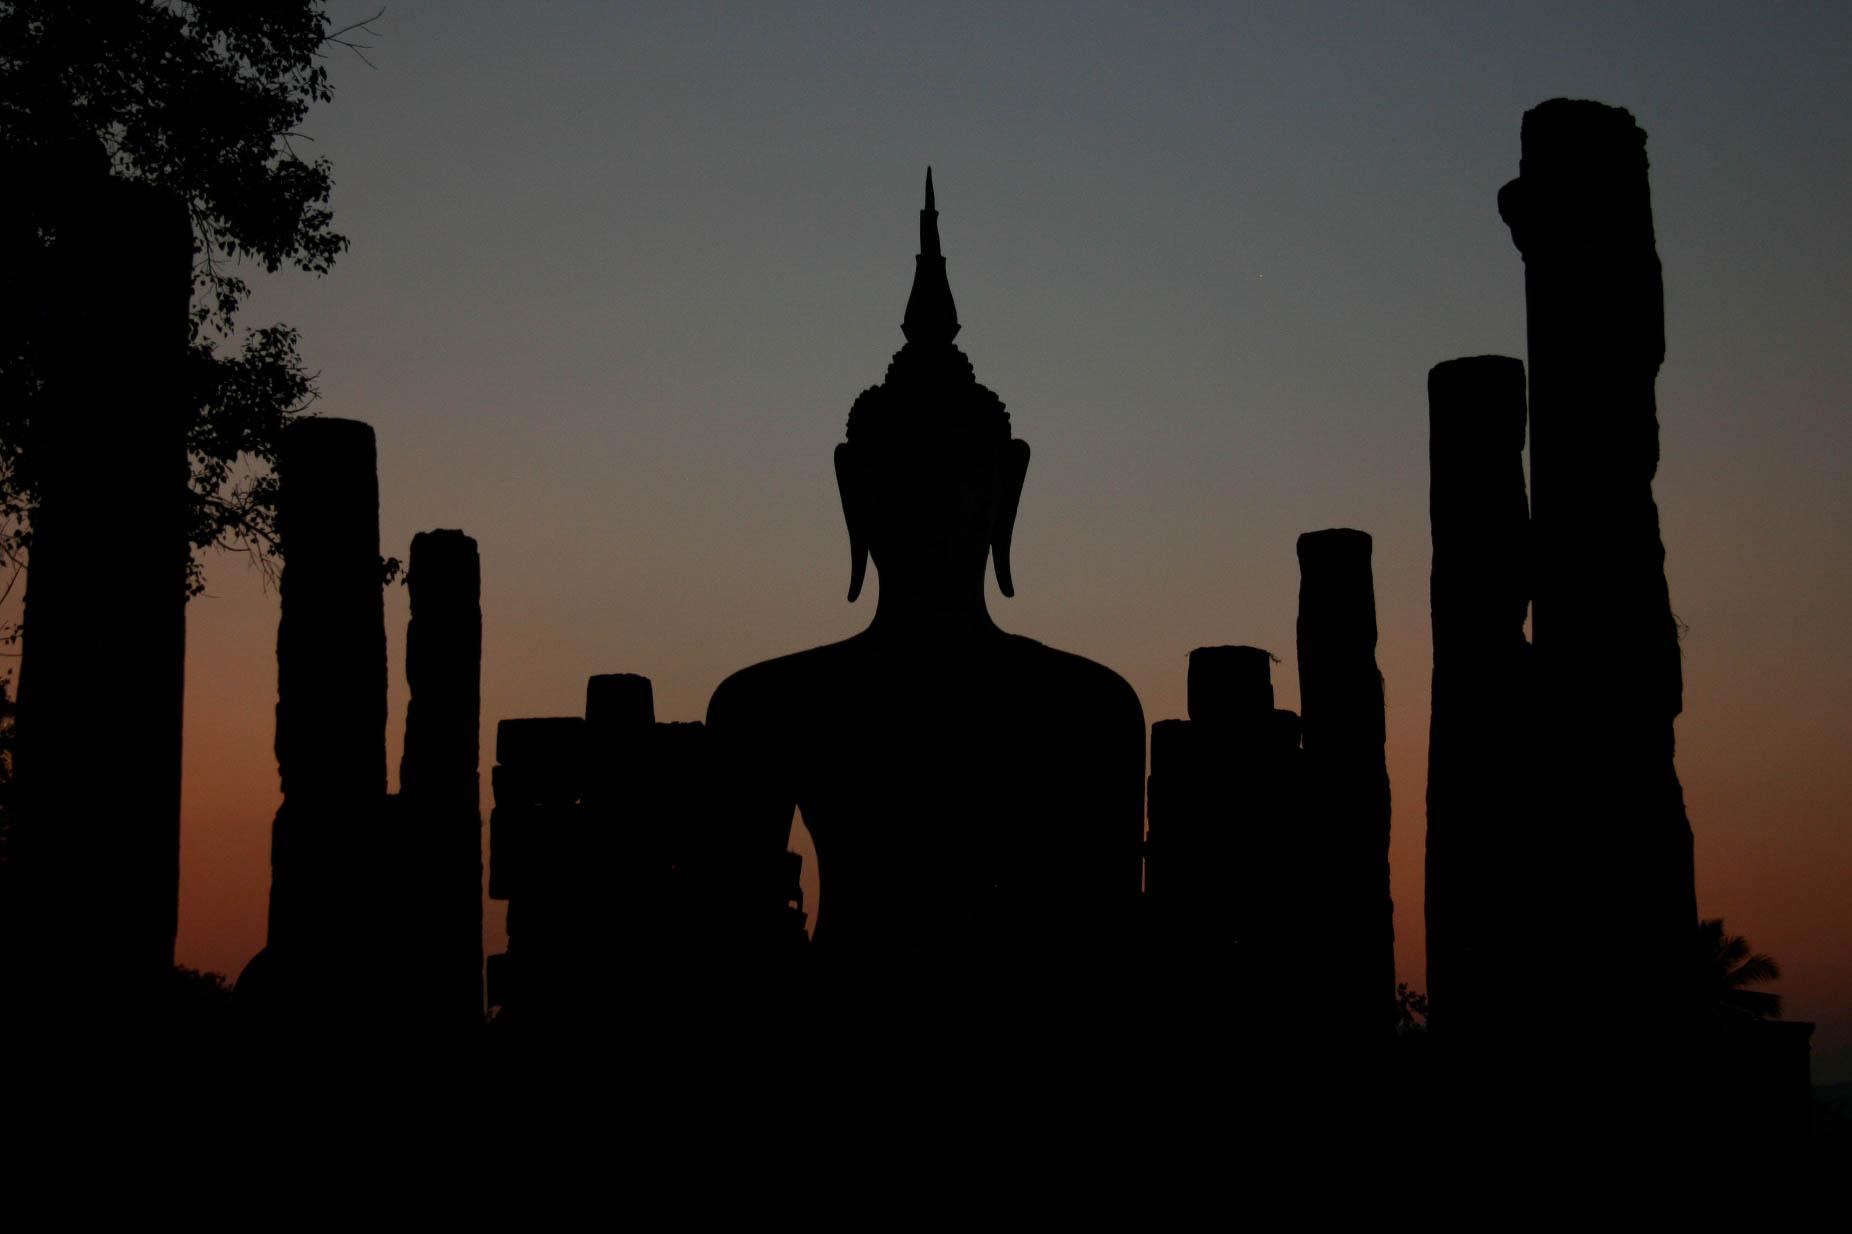 De Wat Mahathat tempel in Ayutthaya, Thailand. December 2009